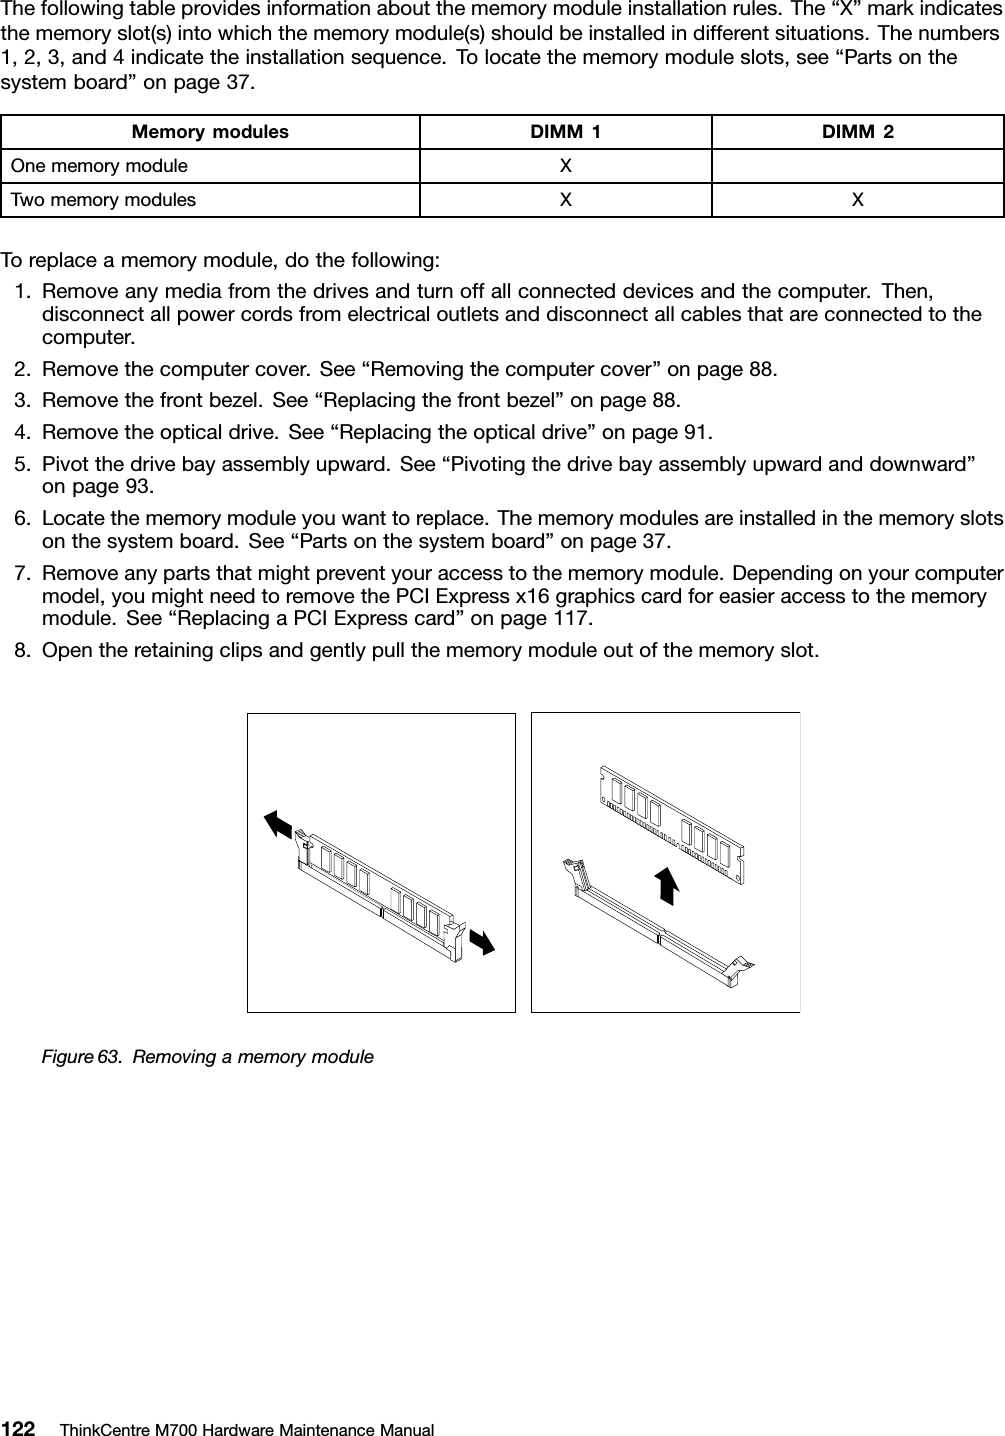 Lenovo M700 Sff Hmm User Manual Hardware Maintenance (HMM) (Small